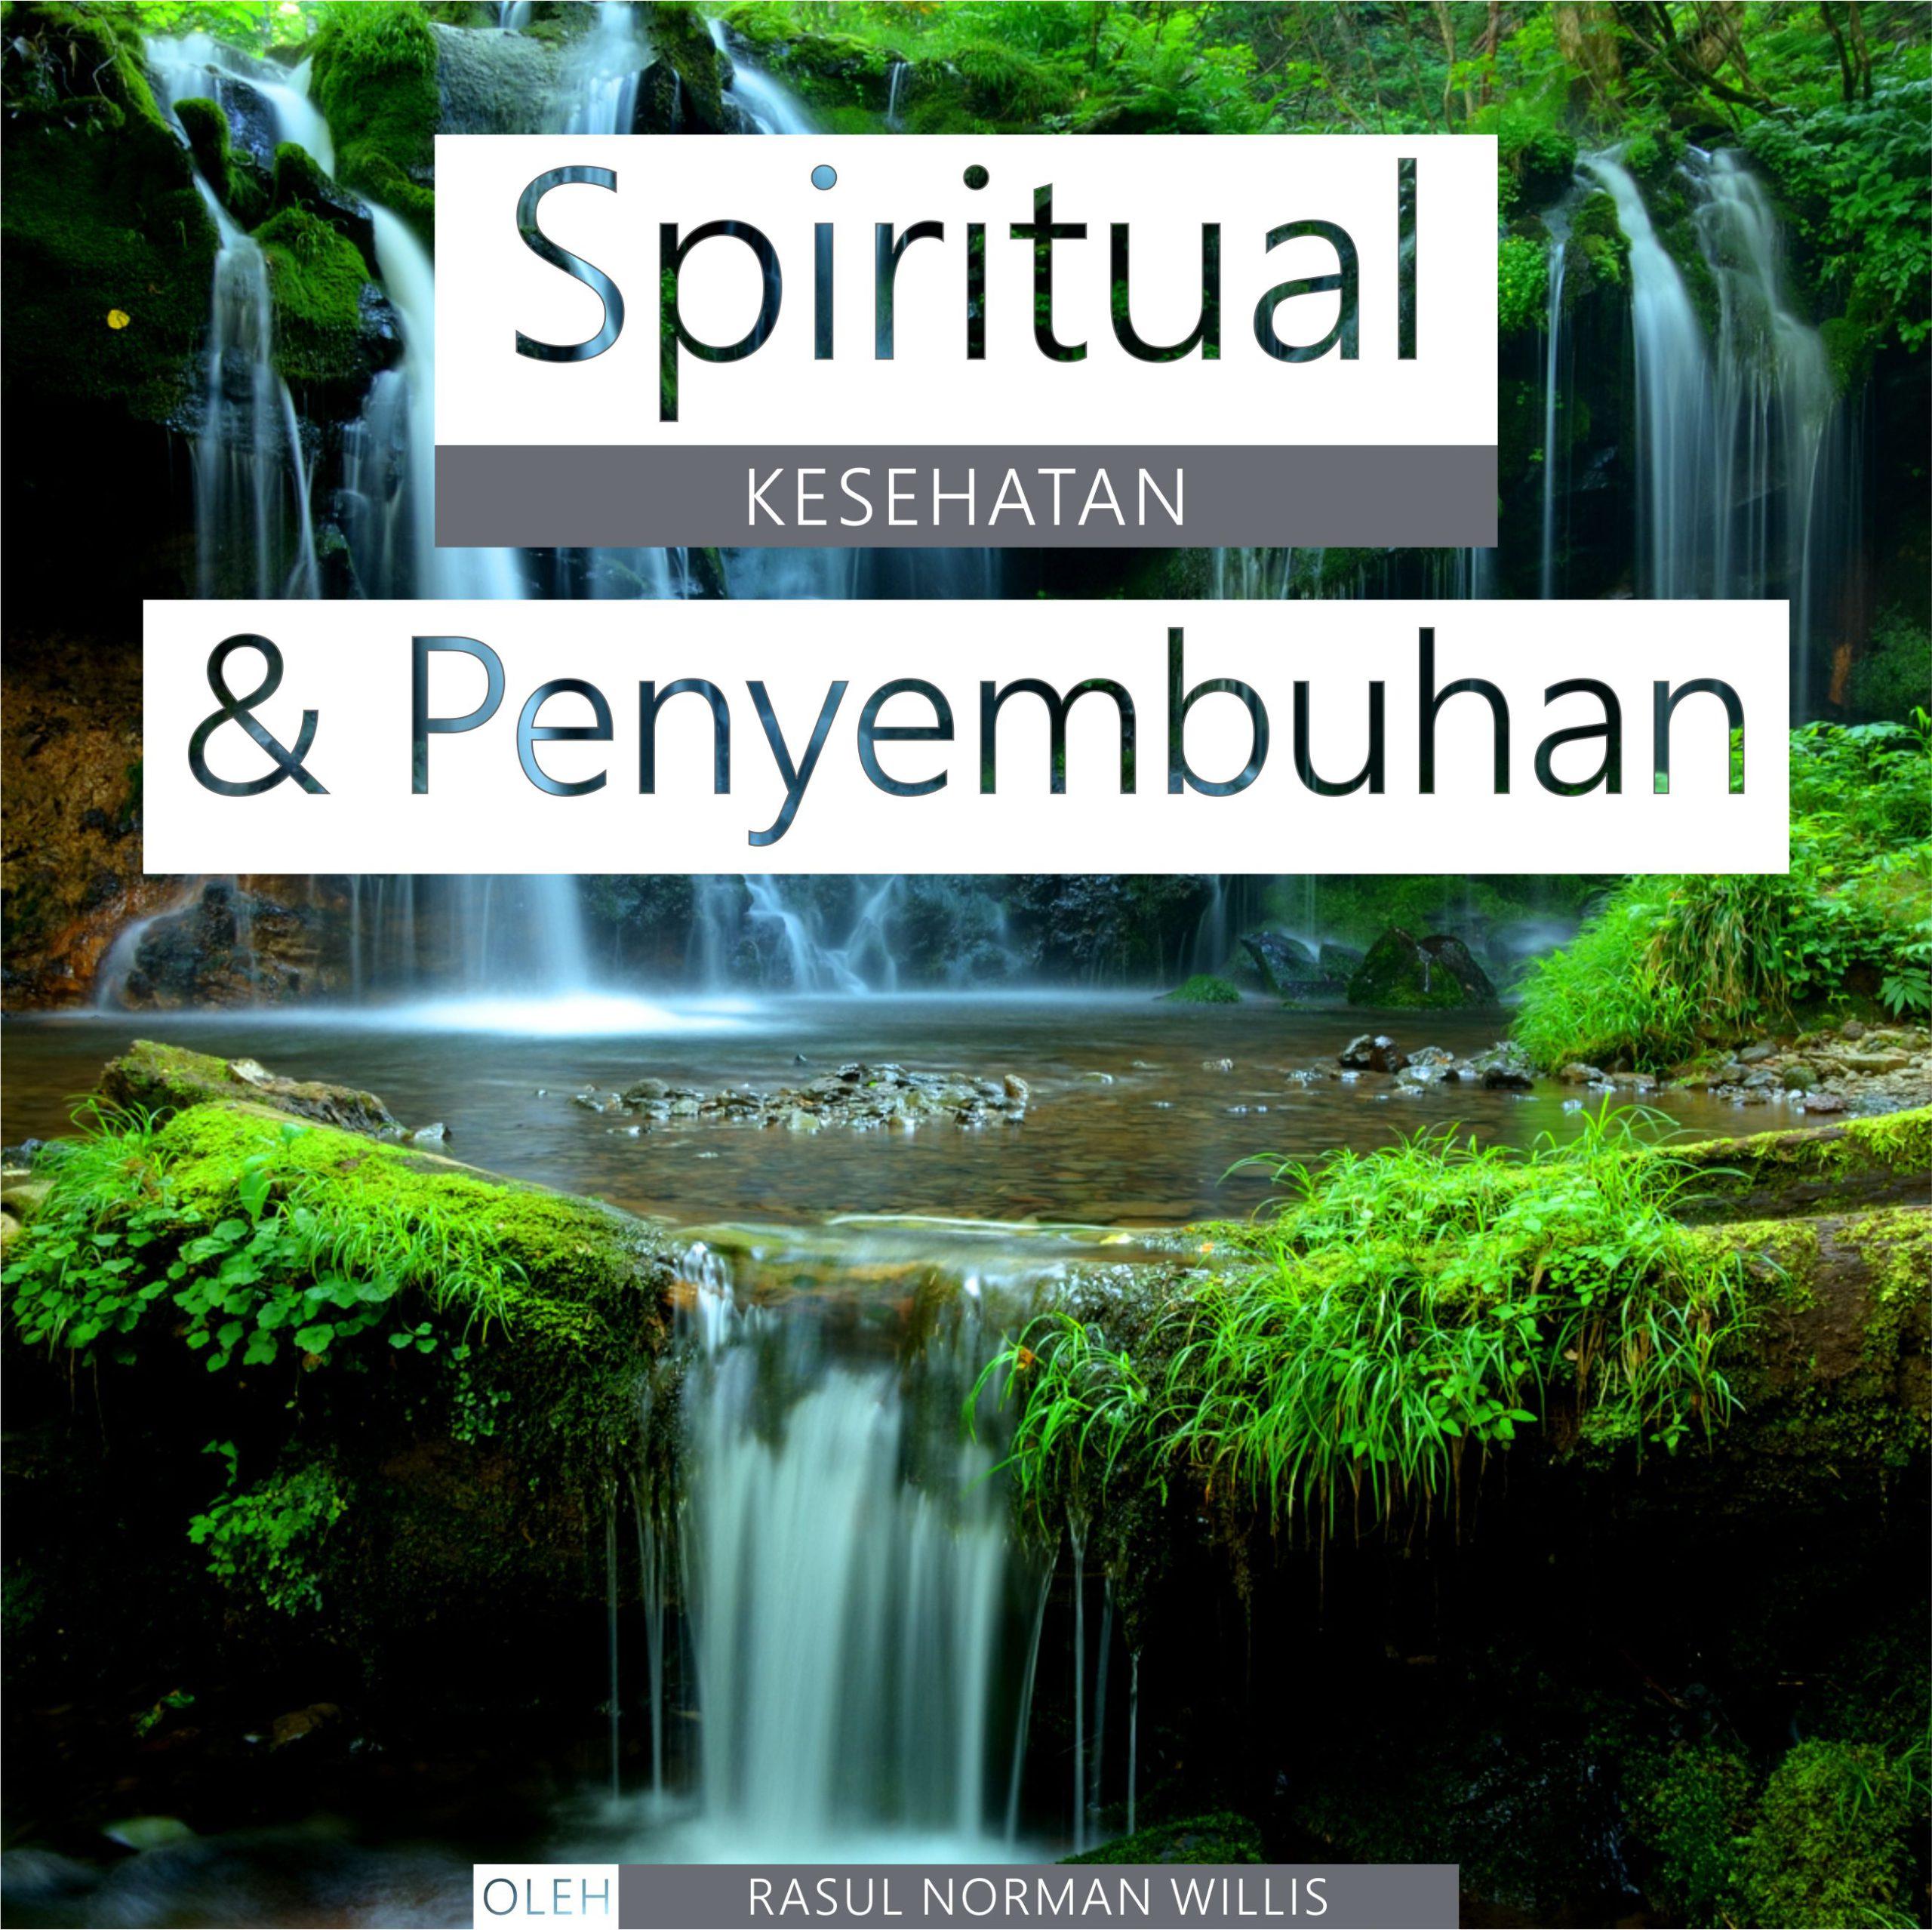 Spiritual Kesehatan & Penyembuhan